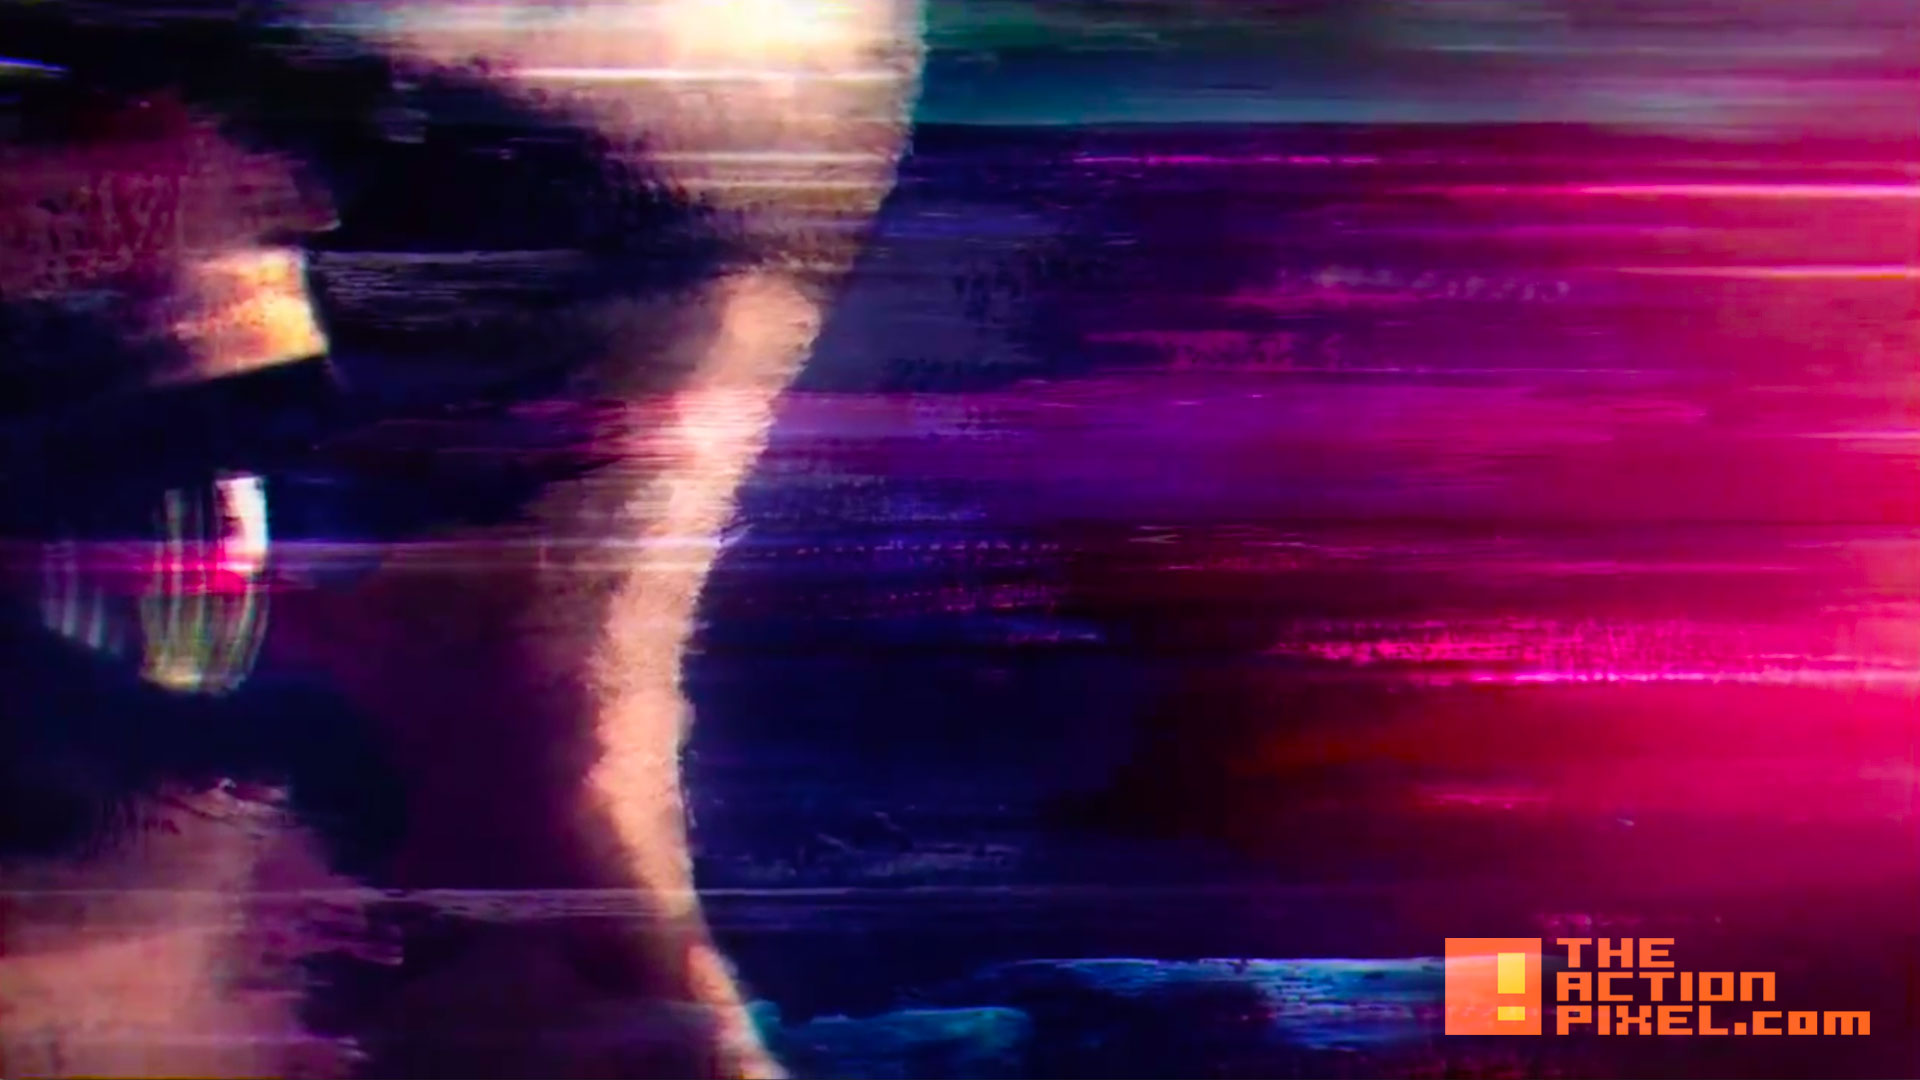 jessica jones opening sequence. the action pixel. @theactionpixel. entertainment on tap. marvel. netflix.